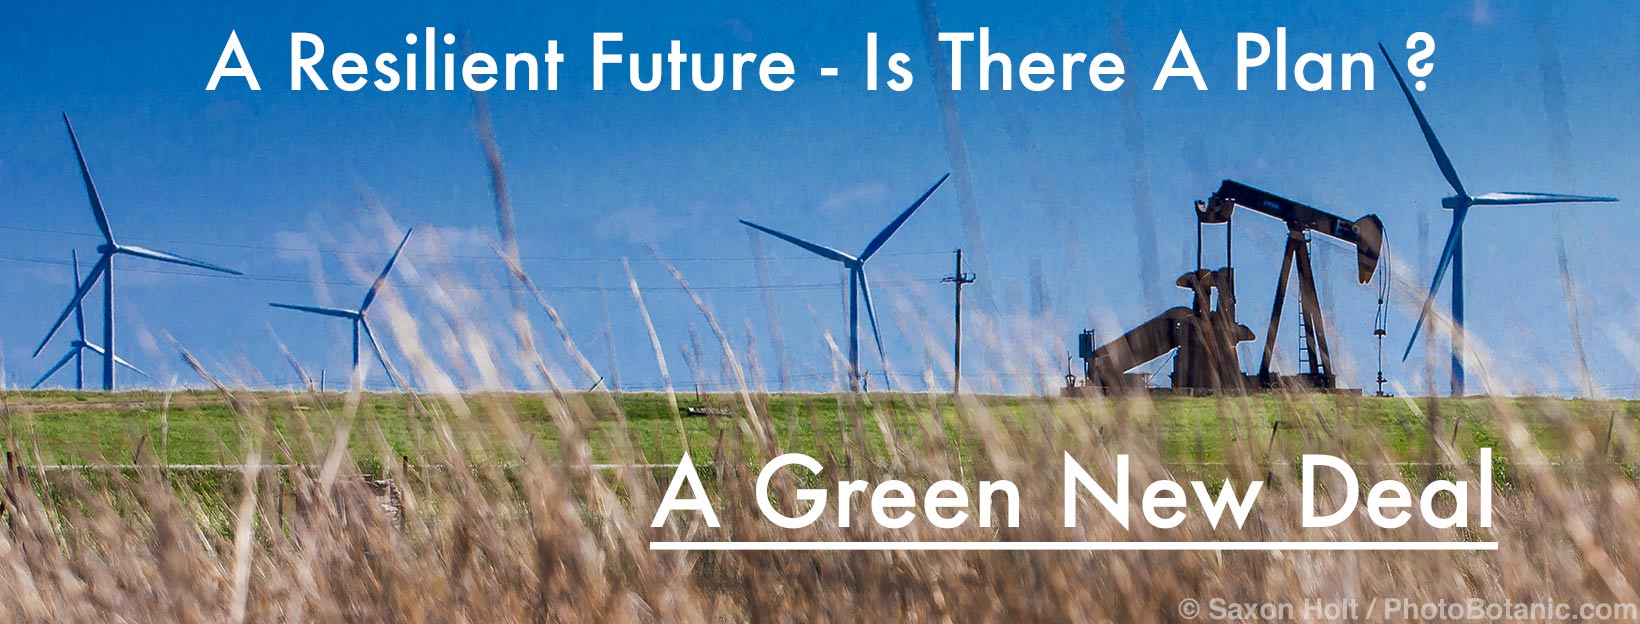 explain green new deal